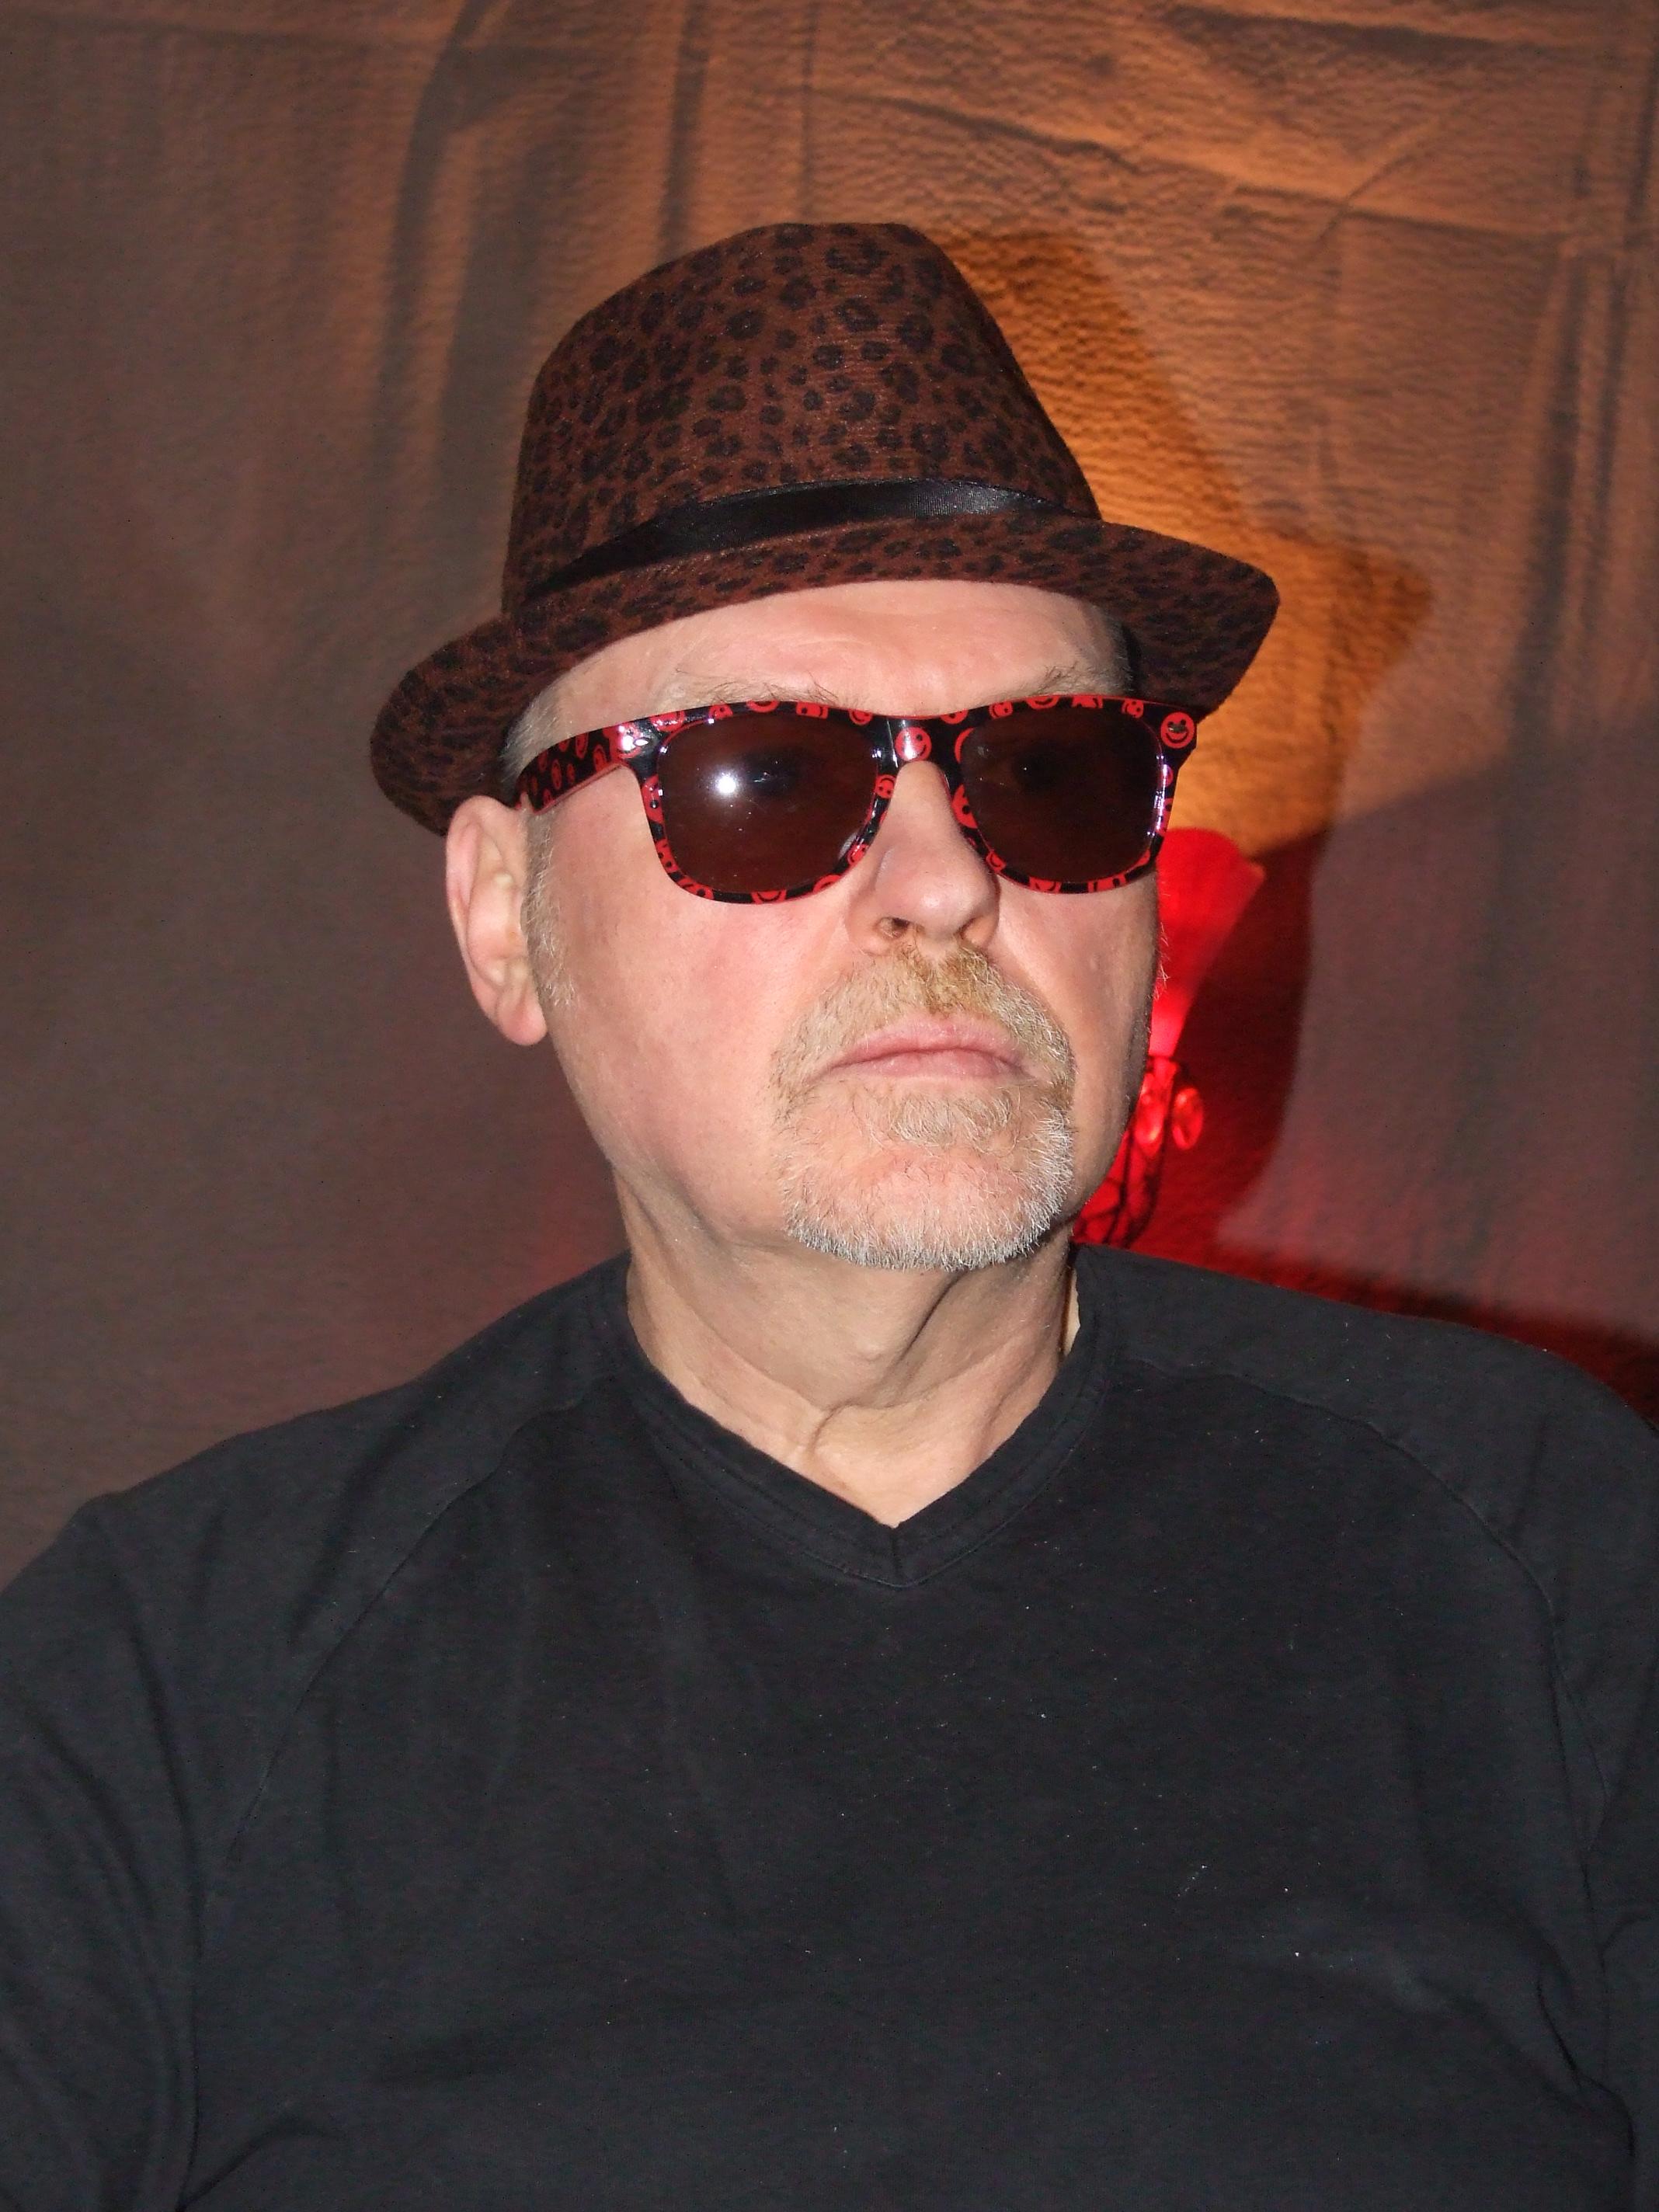 #manwithhatandsunglasses - the wild printed hat